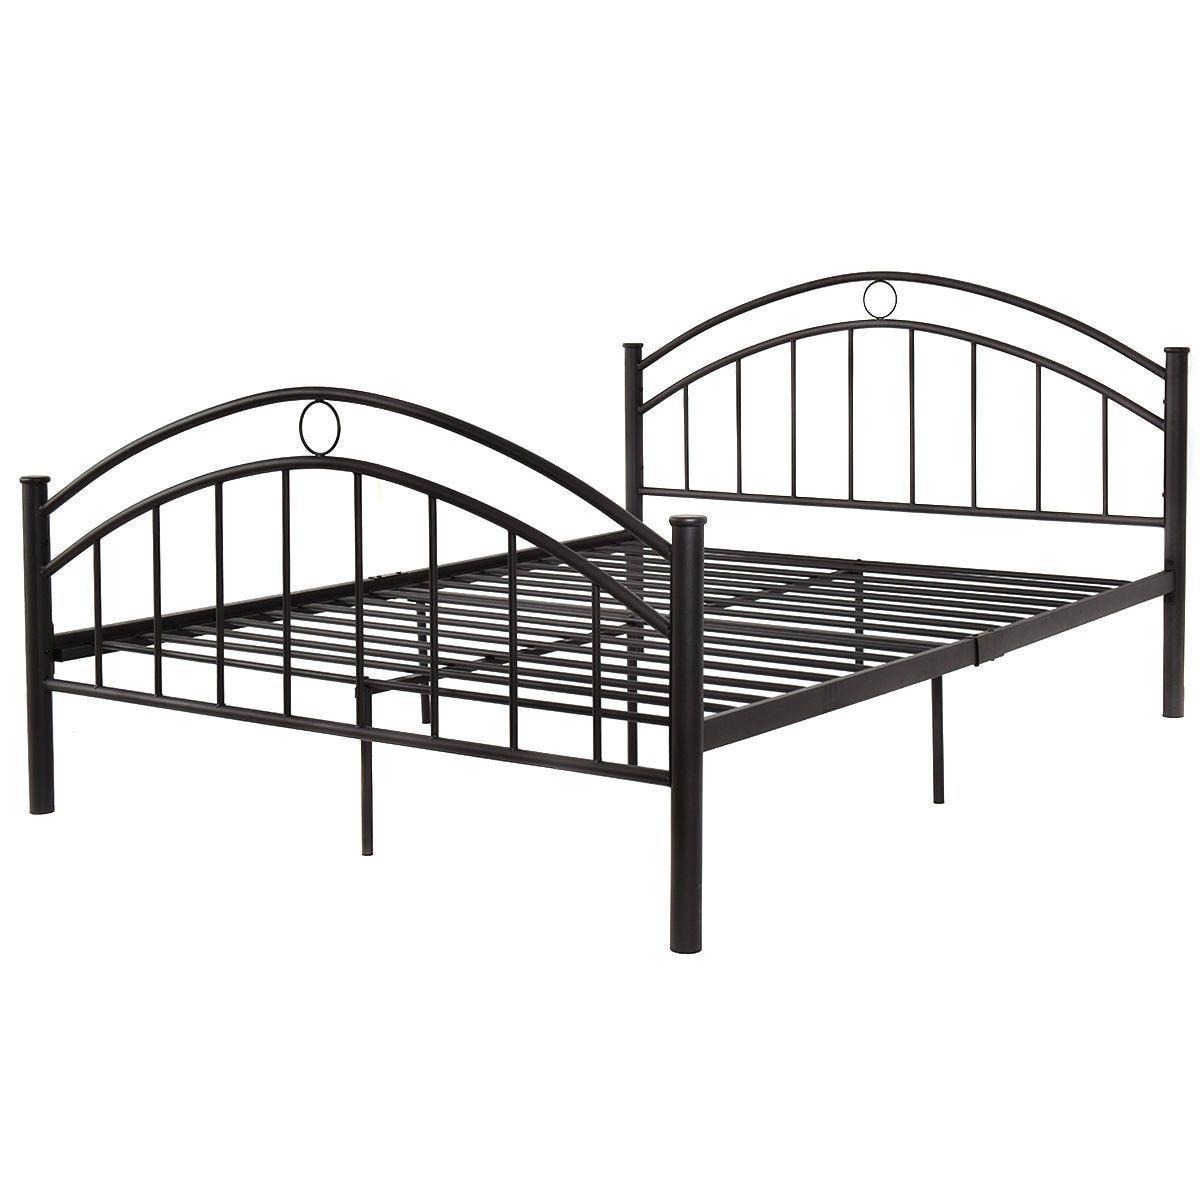 Black Queen Size Metal Steel Bed Frame In 2020 Steel Bed Frame